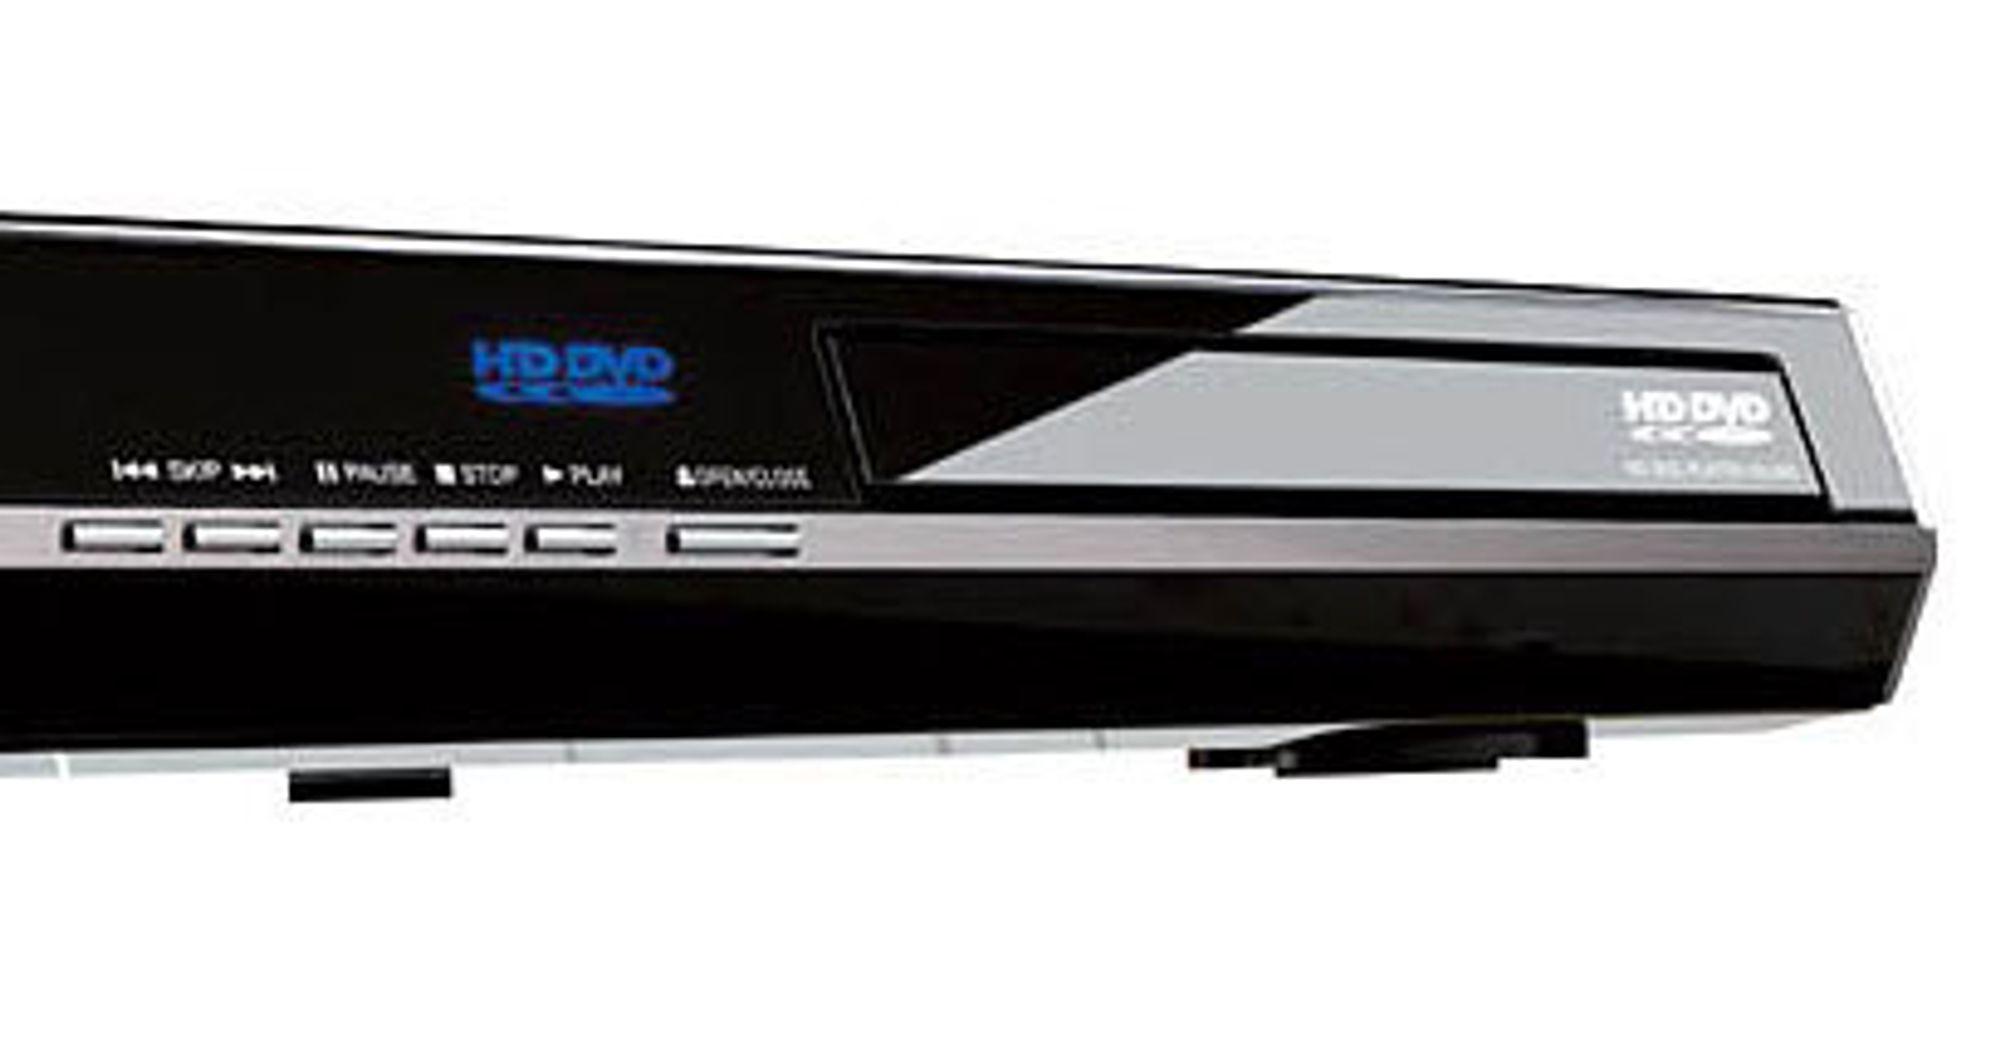 HD-DVD-spiller. Blu-ray. Formatkrig. Formater. HD. HD-kvalitet. High definition. Video. DVD.